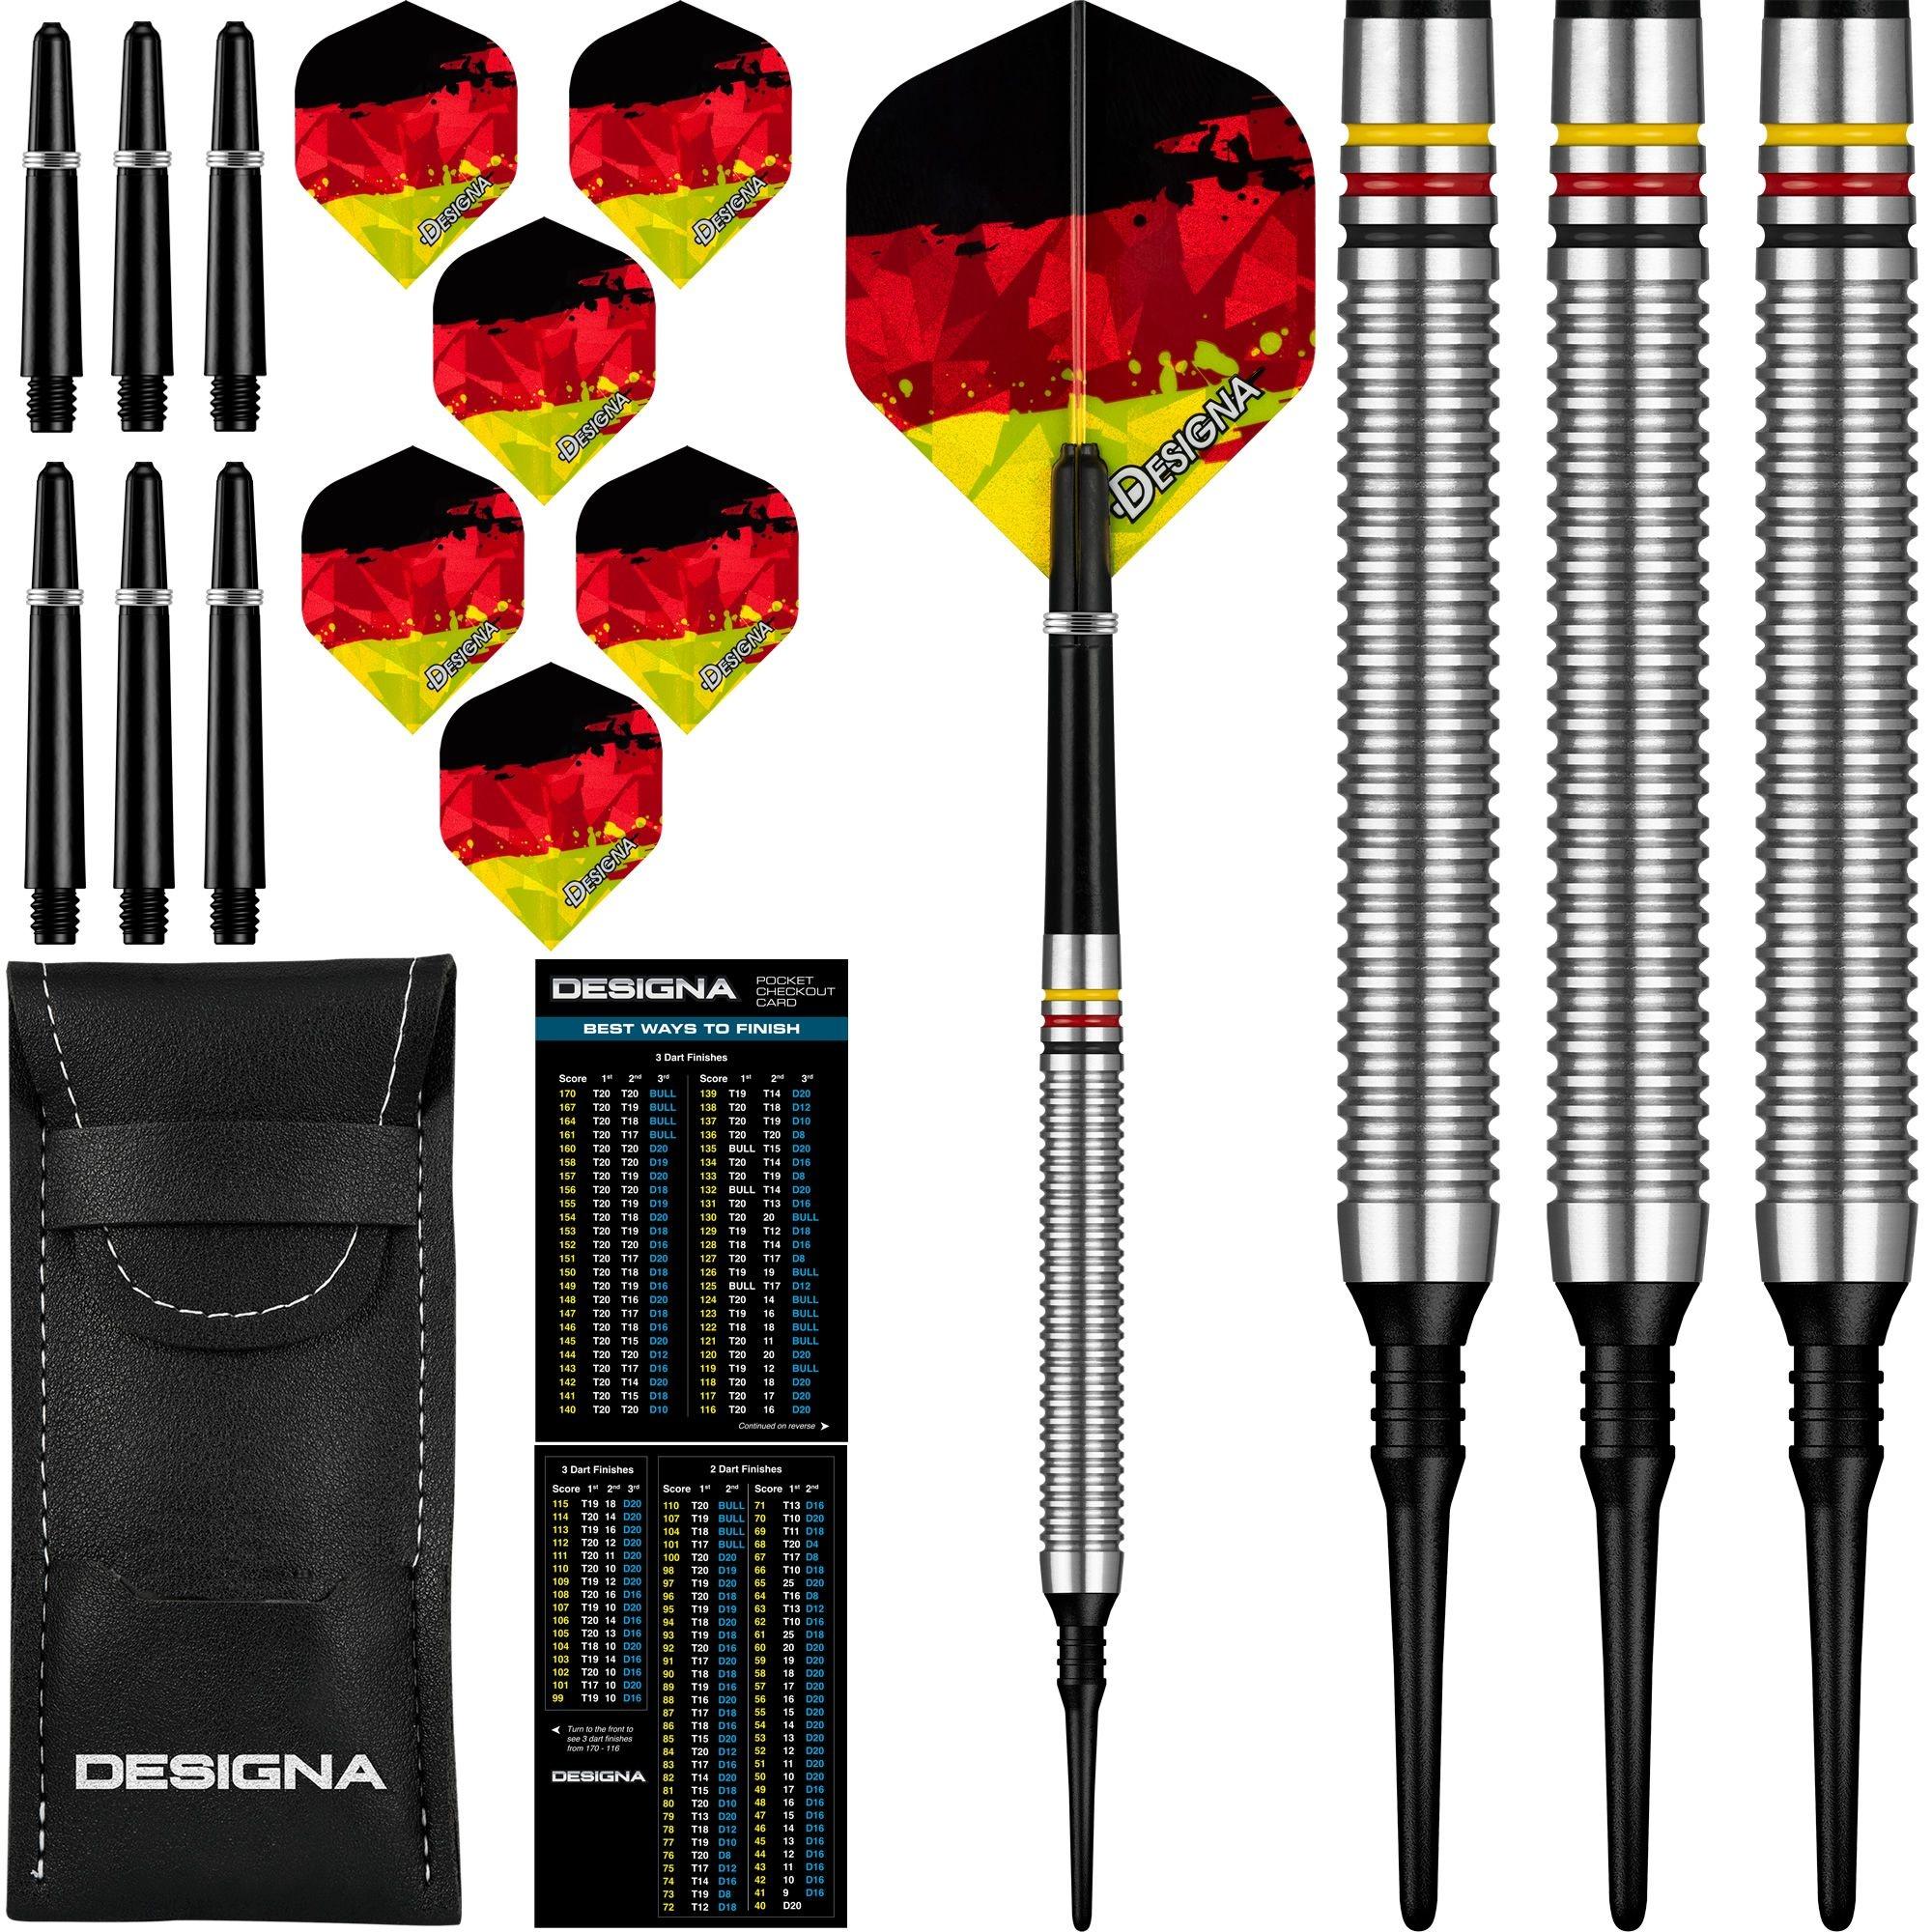 Patriot X Germany 90% Soft Tip